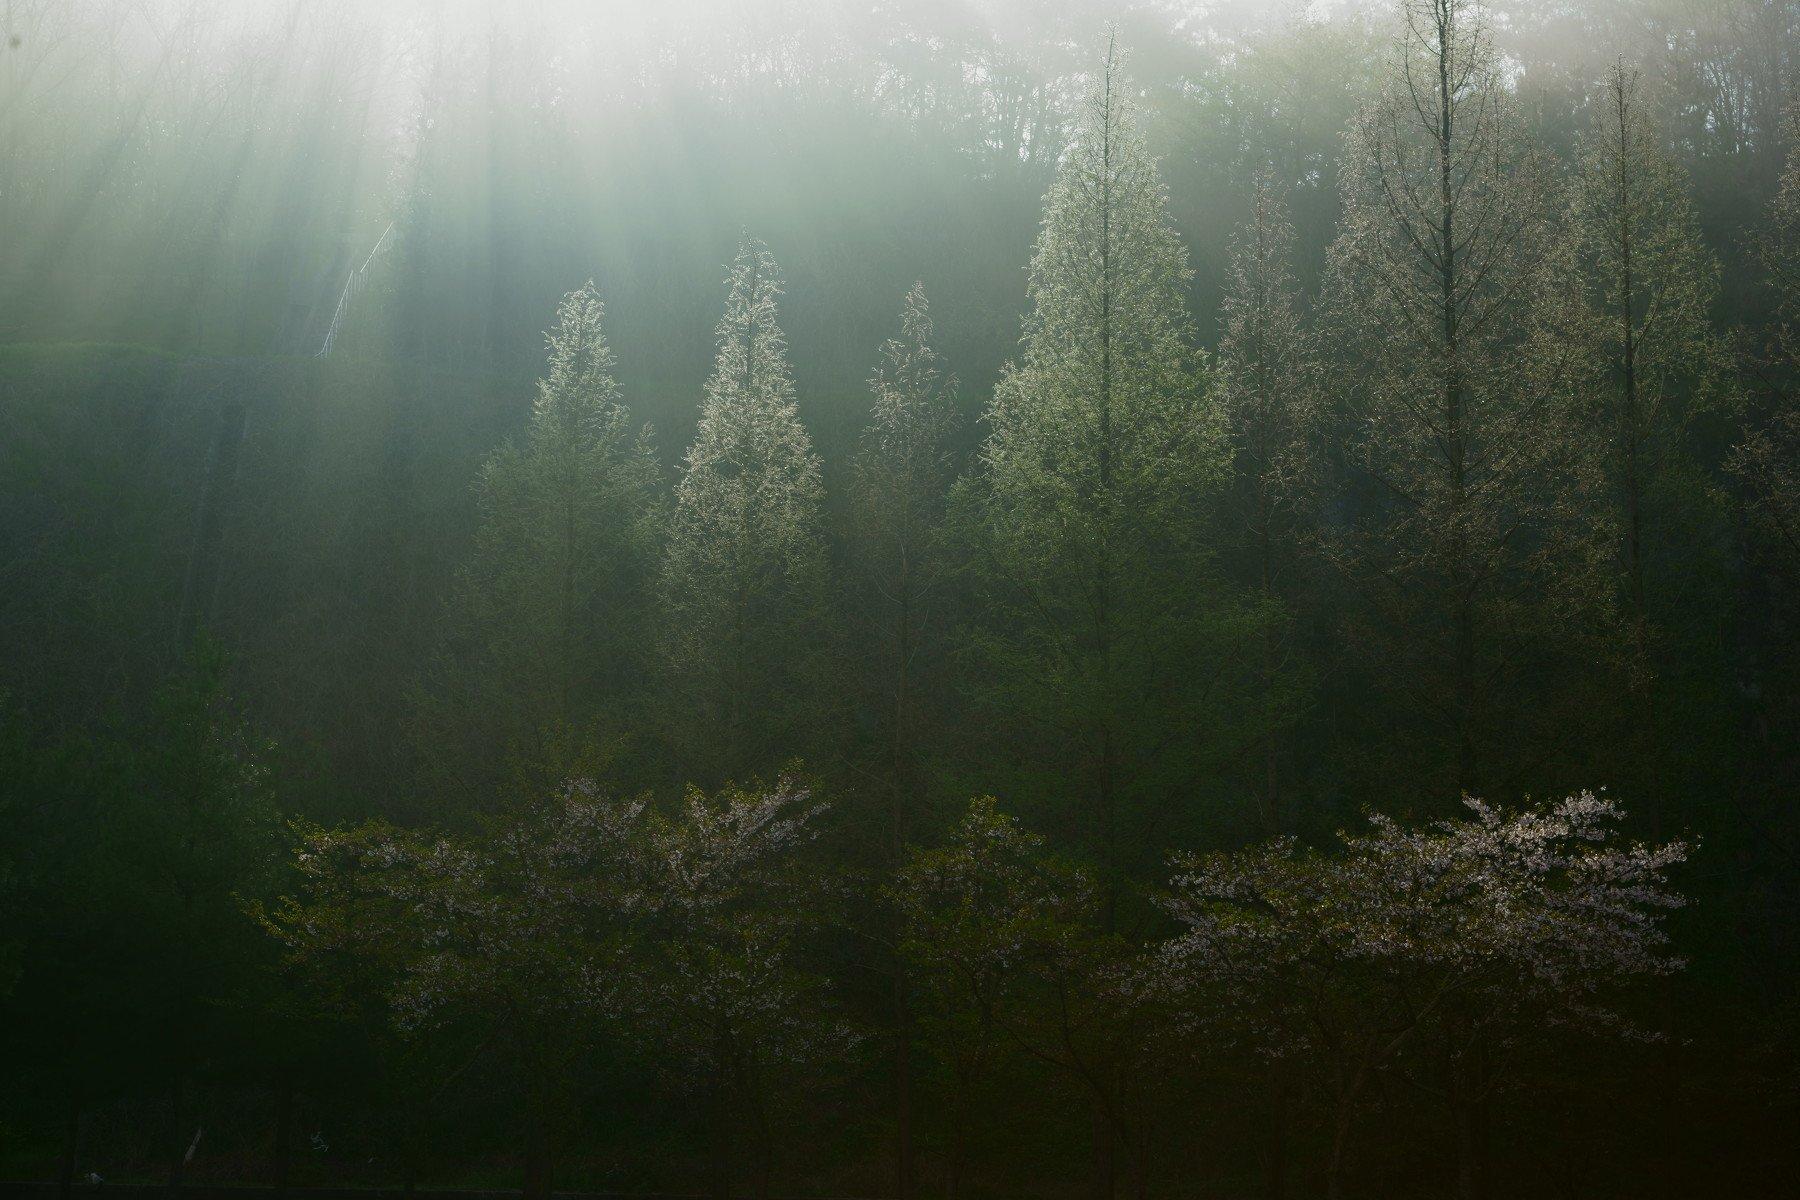 korea,spring,fog,sunlight,cherry blossom,, Shin